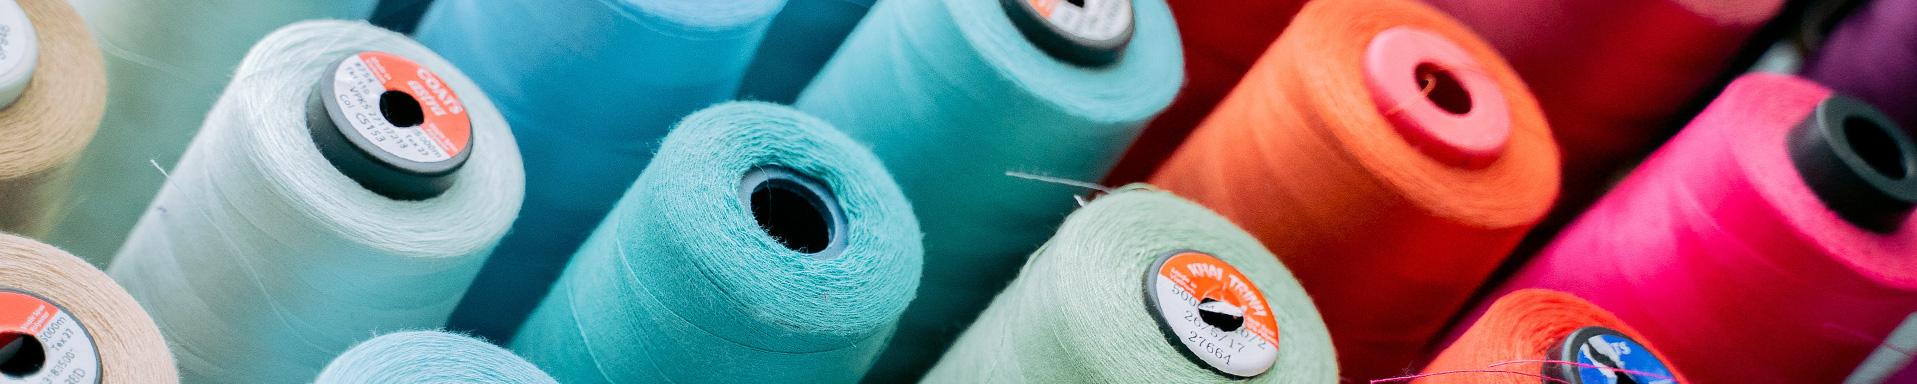 Textilien als Werbeartikel